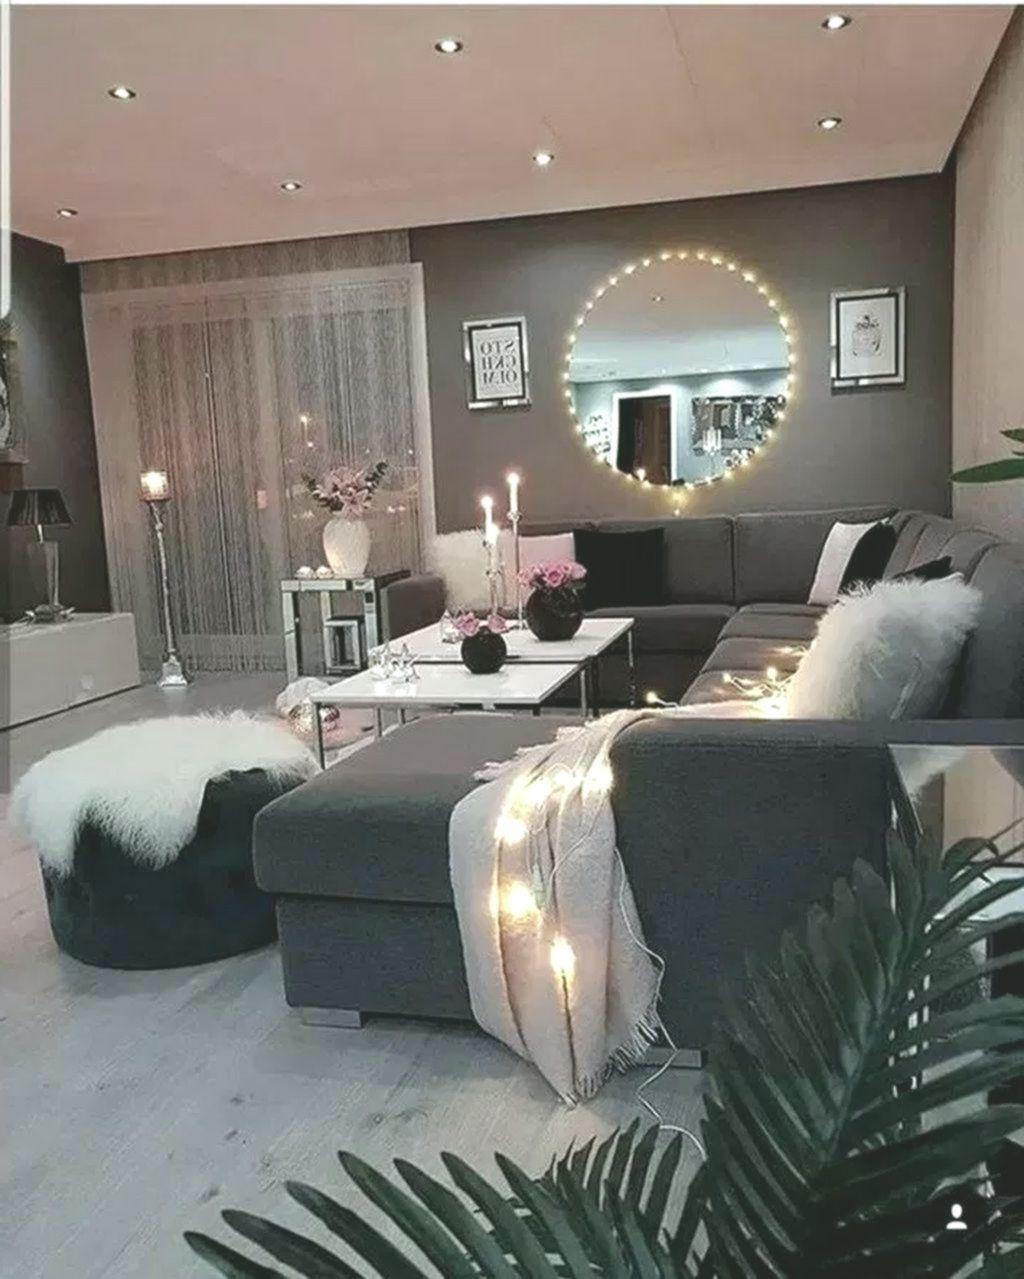 45 Impressive Apartment Living Room Decorating Ideas On A Budget